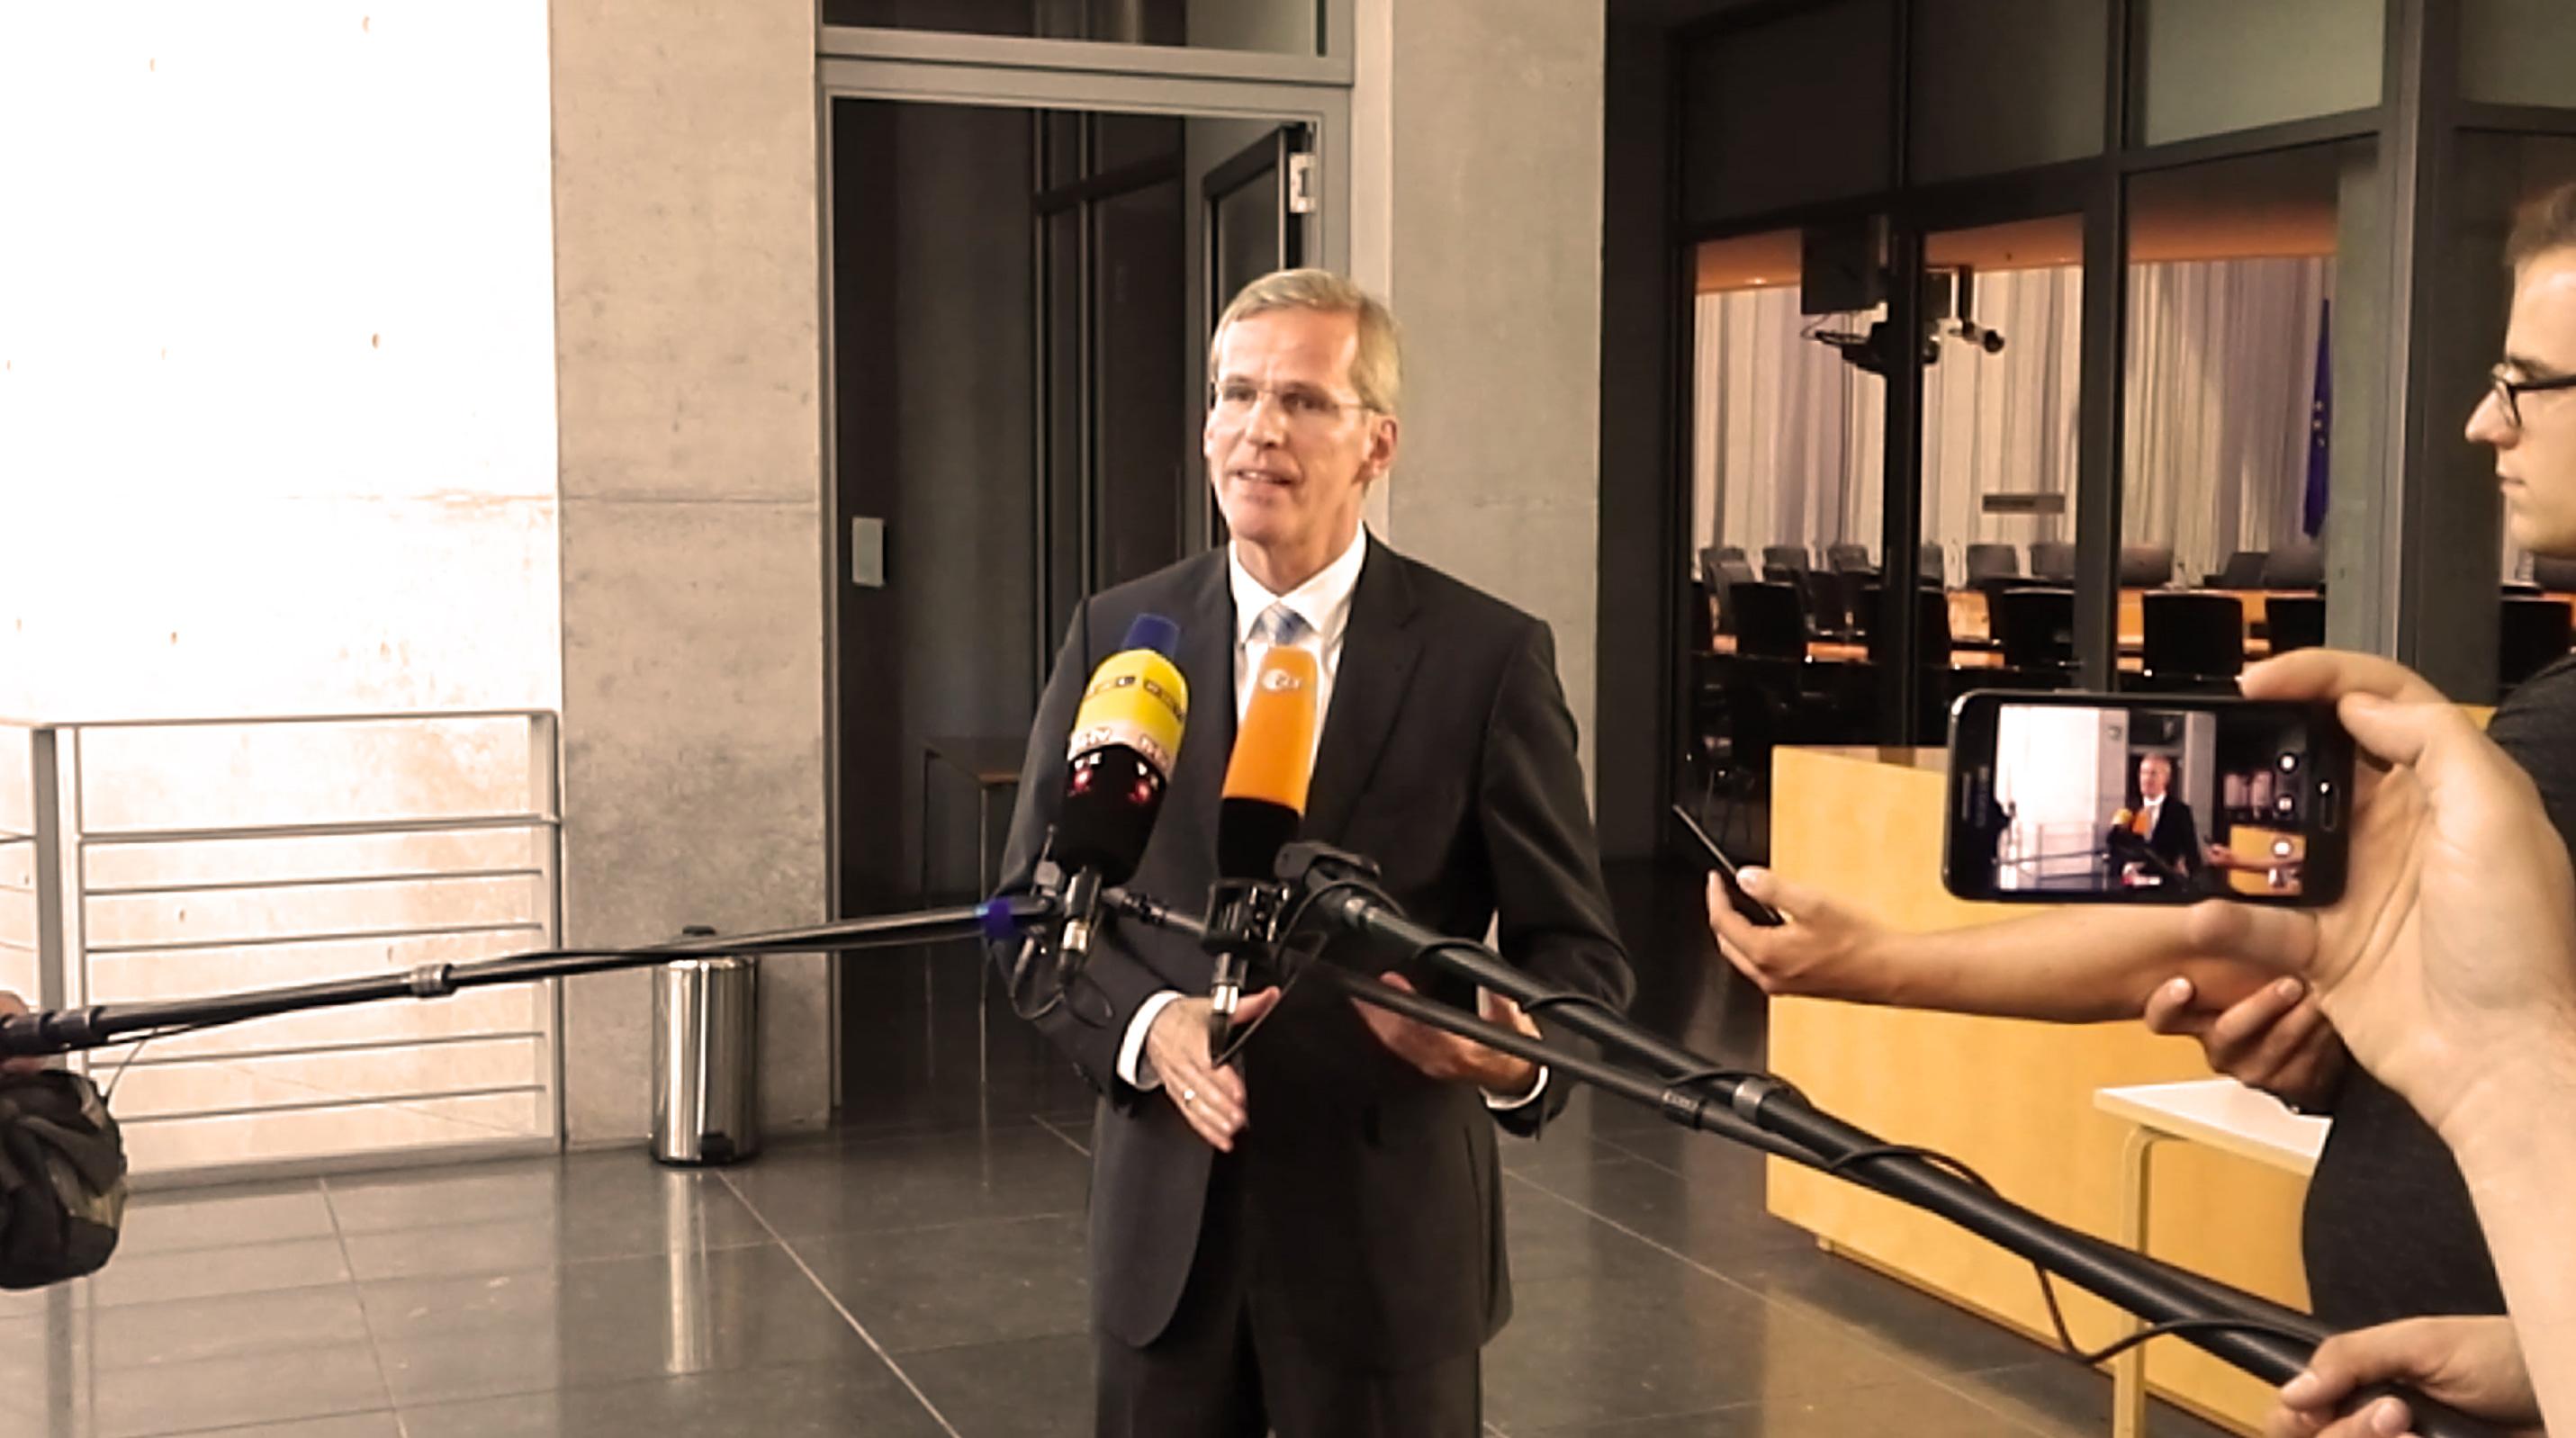 Clemens Binninger (CDU)